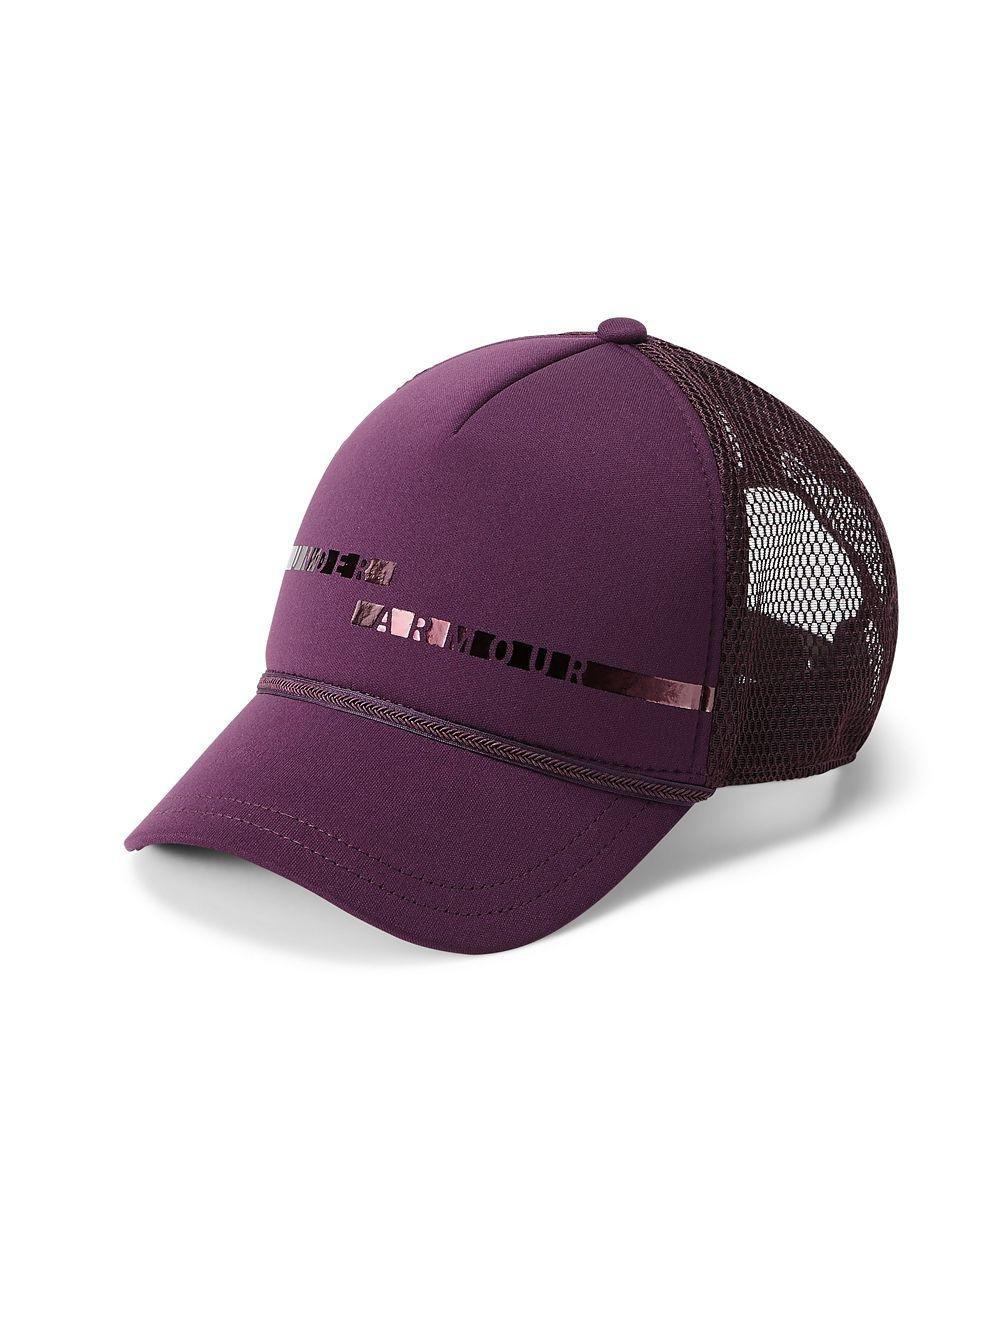 d3911ad94dd Lyst - Under Armour Graphic Trucker Cap in Purple for Men